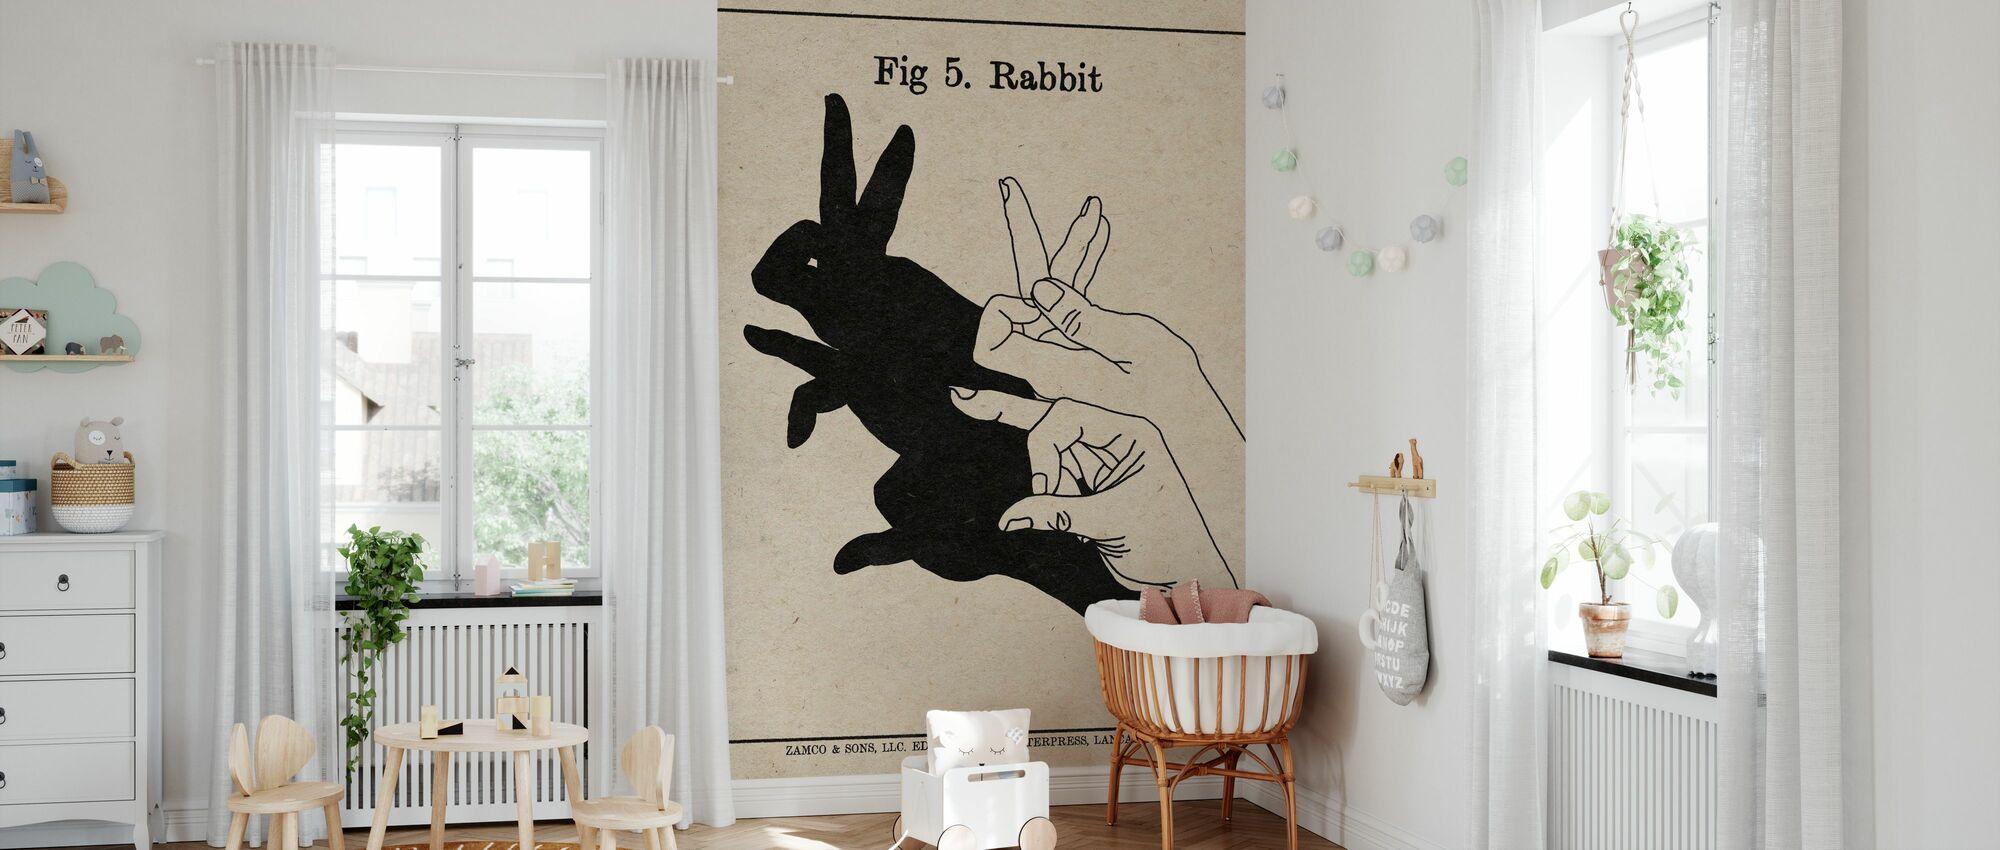 The Art of Shadows - Rabbit - Wallpaper - Nursery